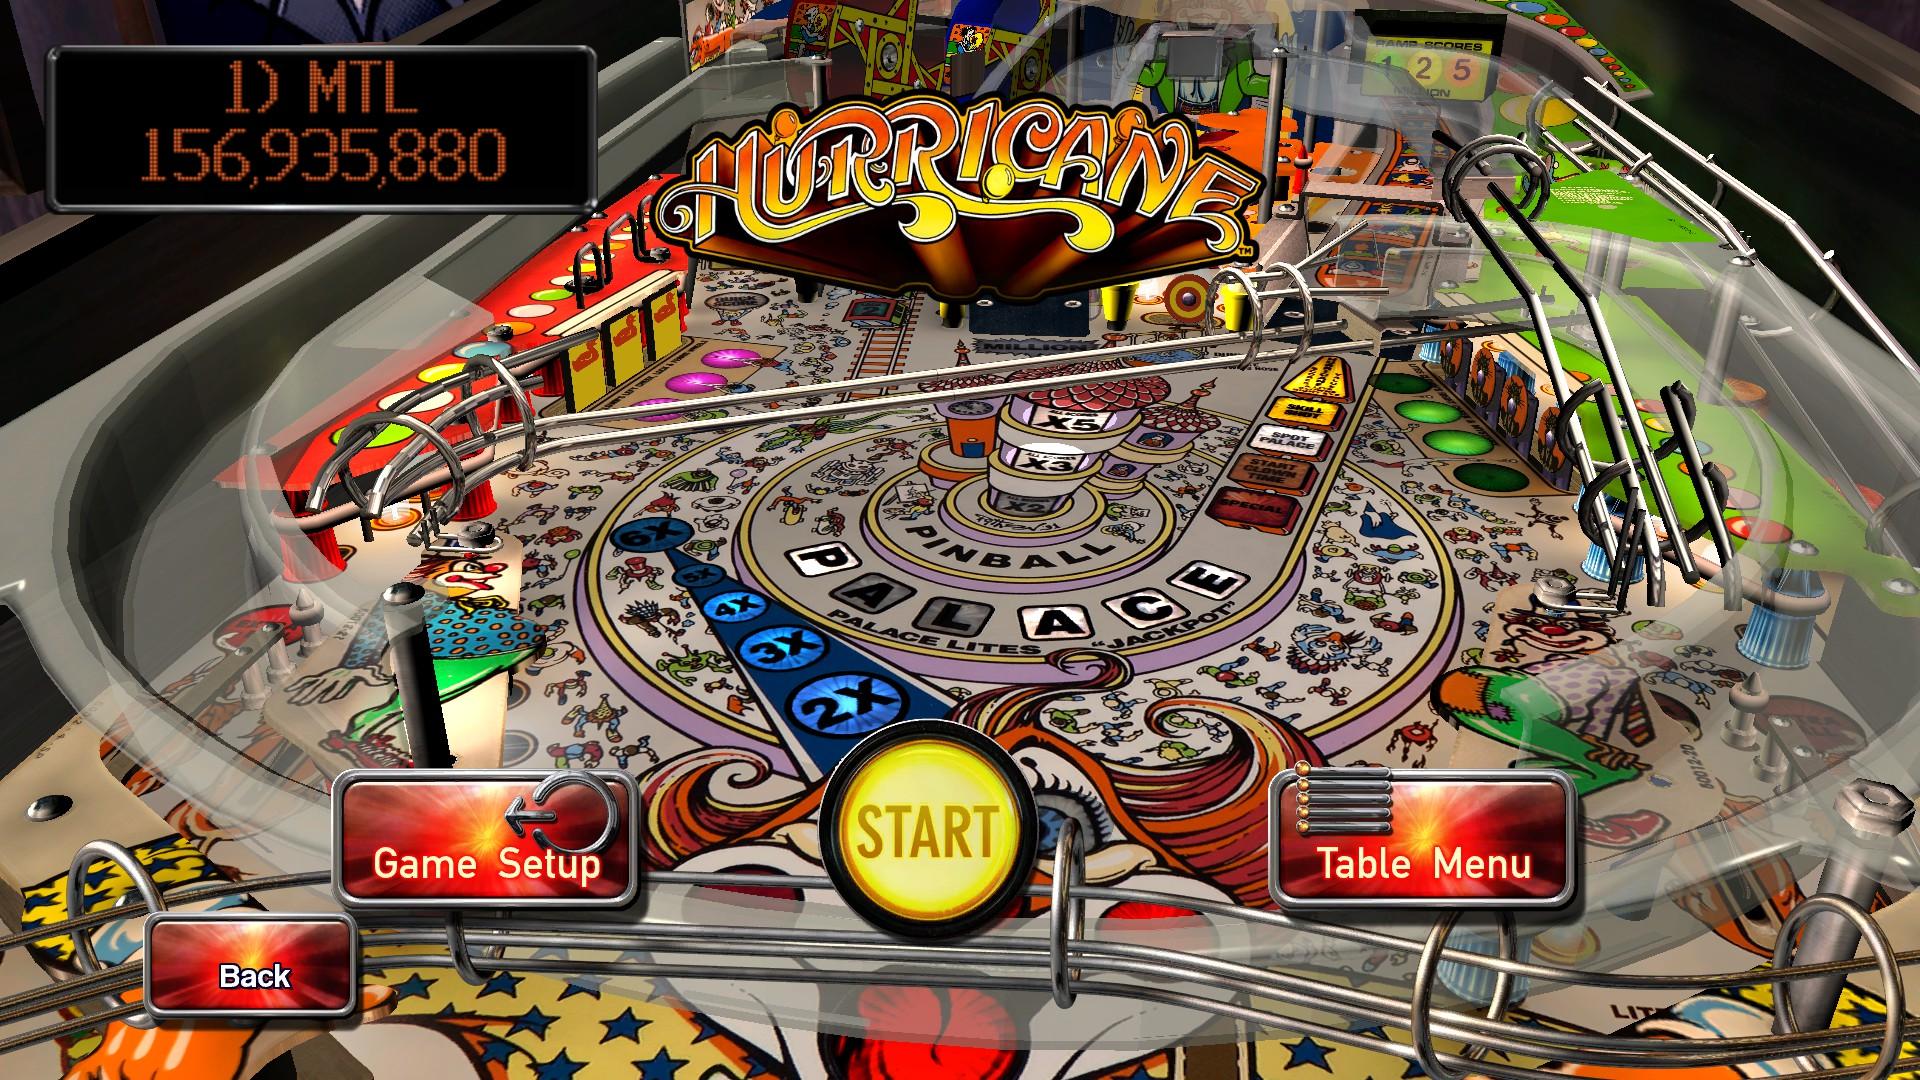 Mantalow: Pinball Arcade: Hurricane (PC) 156,935,880 points on 2016-04-20 11:24:53